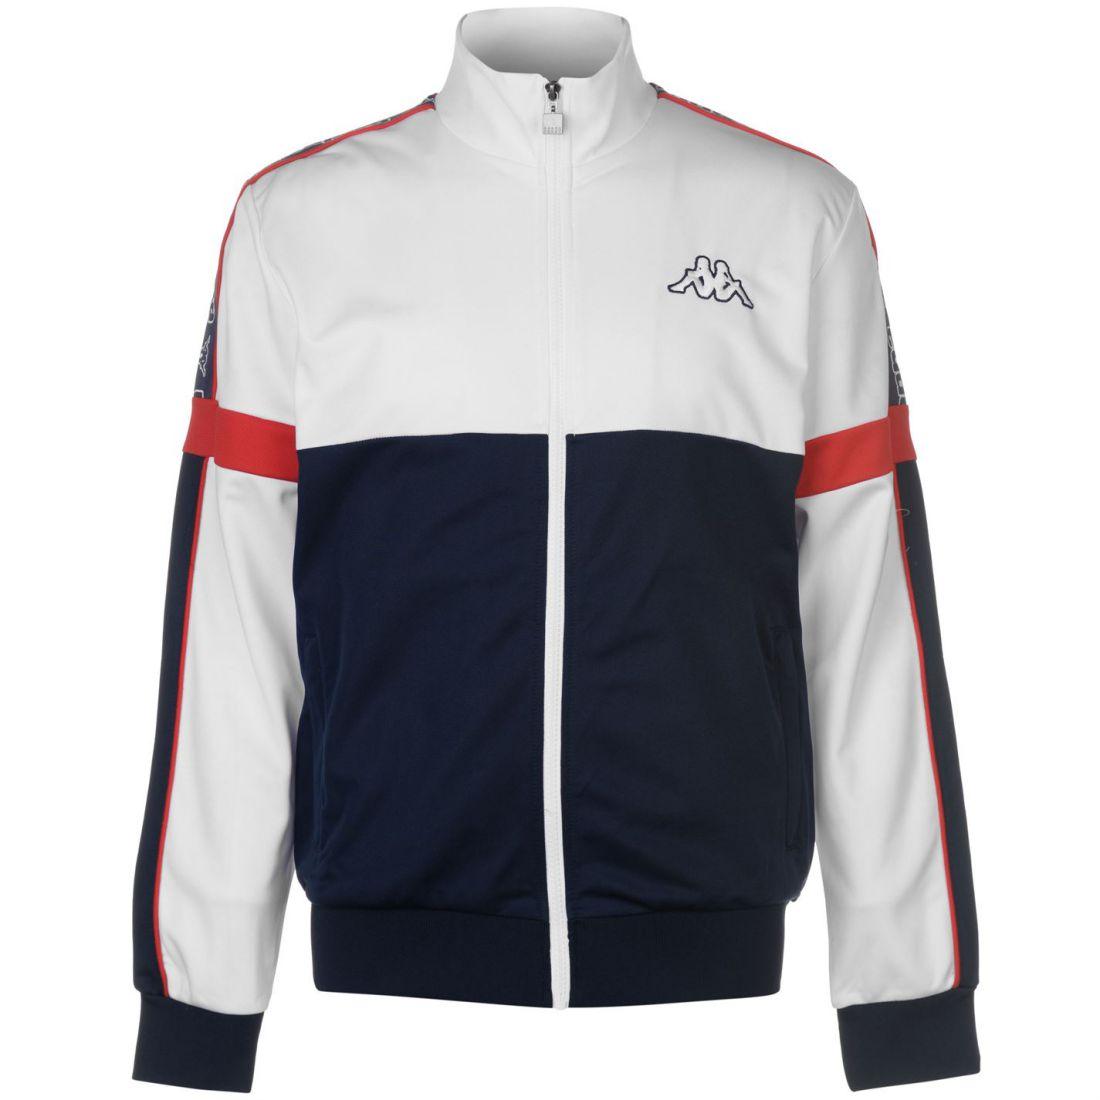 Kappa Panel Jacket Mens Gents Tracksuit Top Coat Full Length Sleeve ... 94565dad20f8